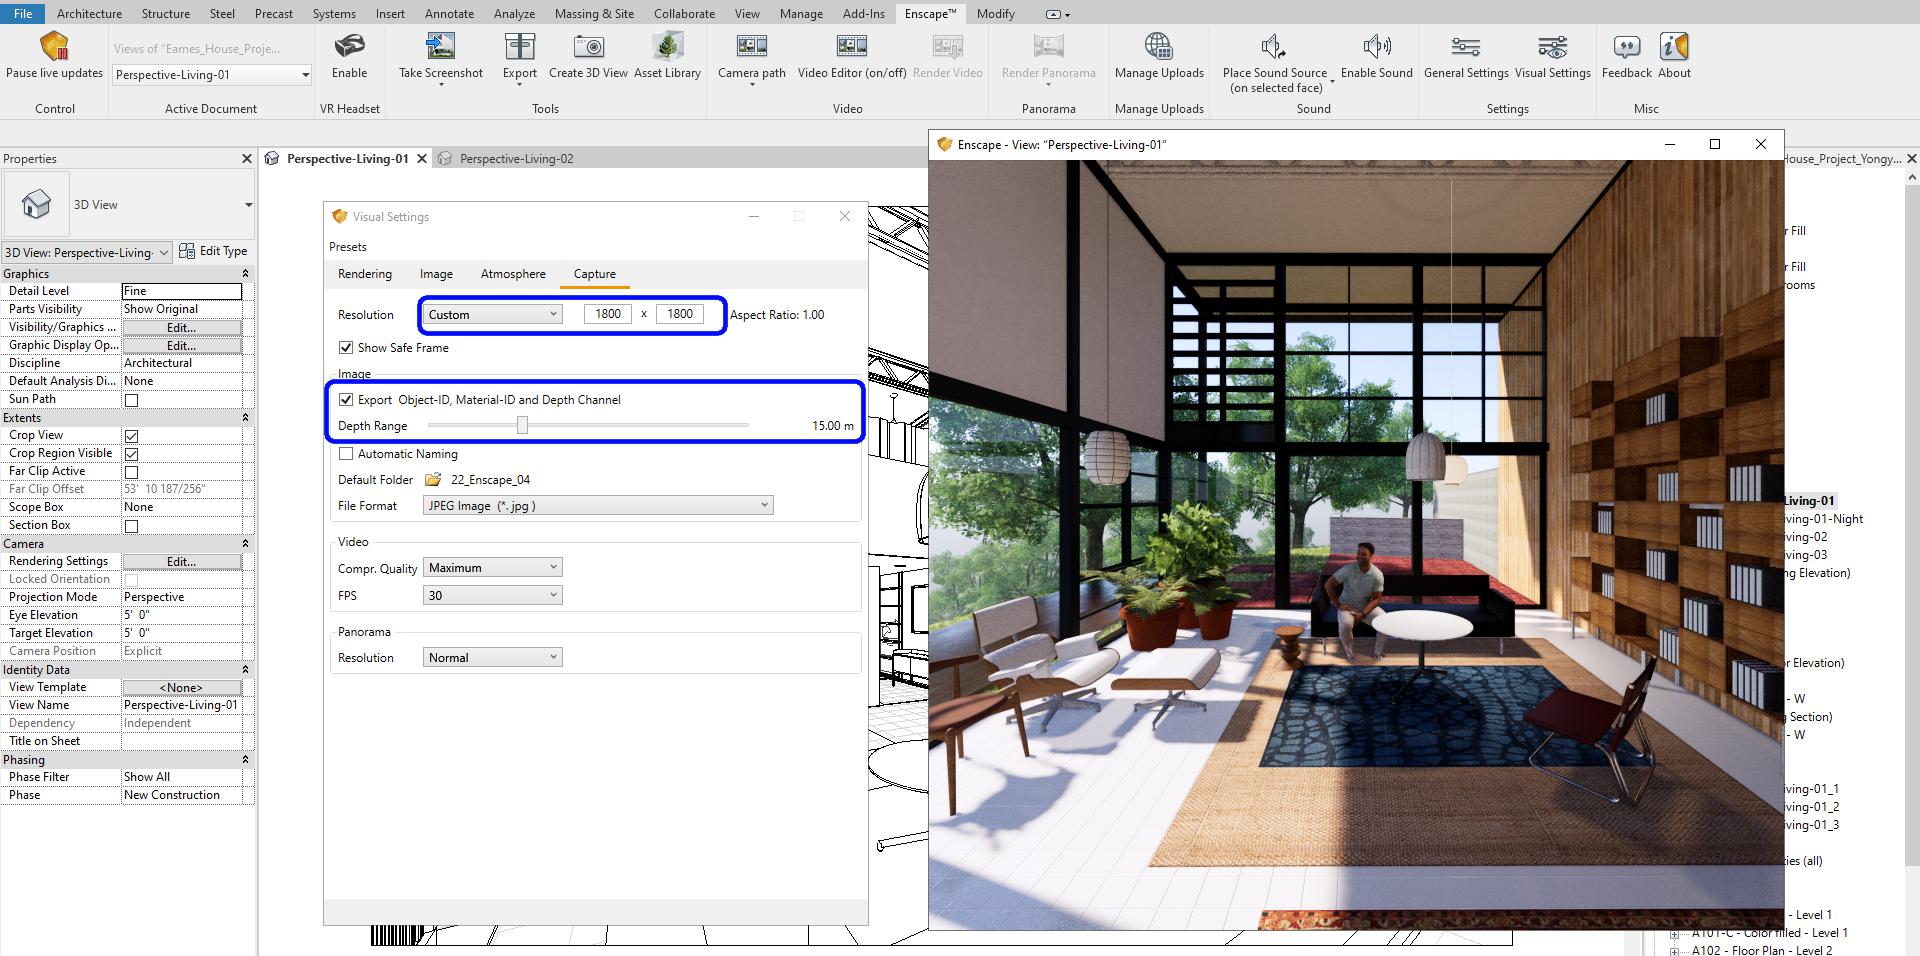 It indicates how to set a custom image size.